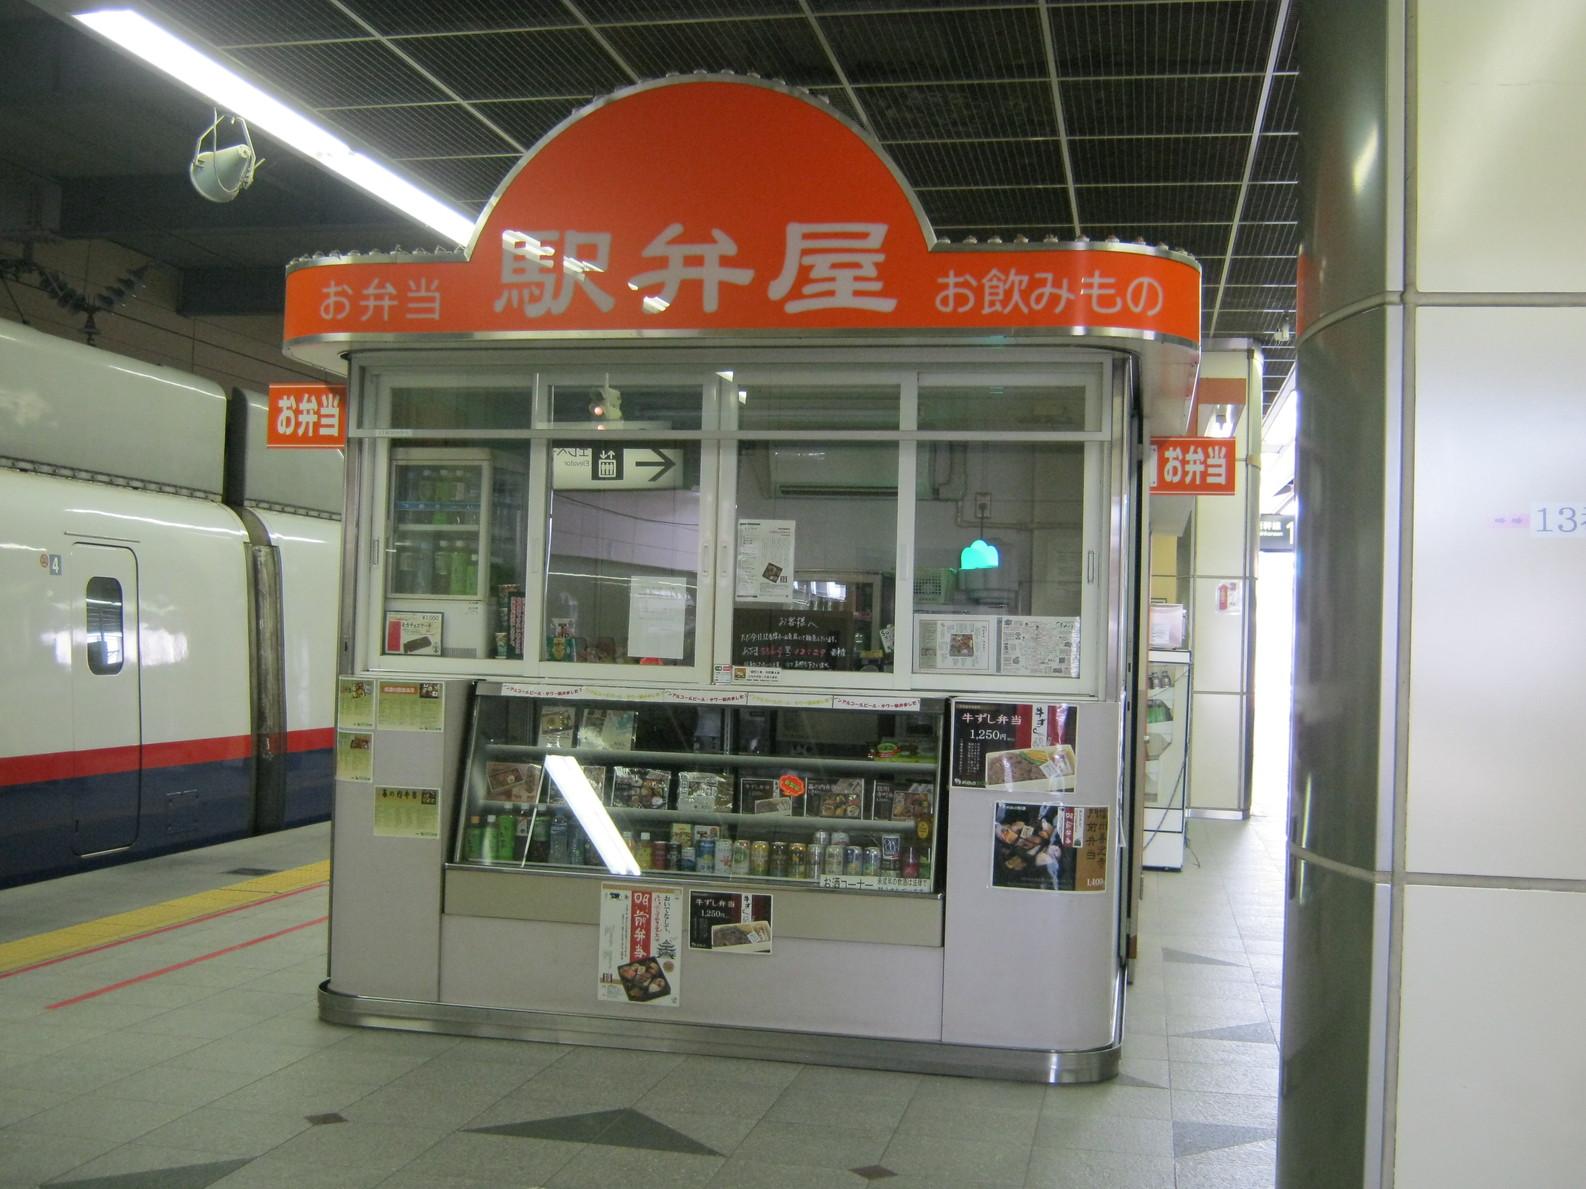 駅弁屋 長野駅新幹線上りホーム売店